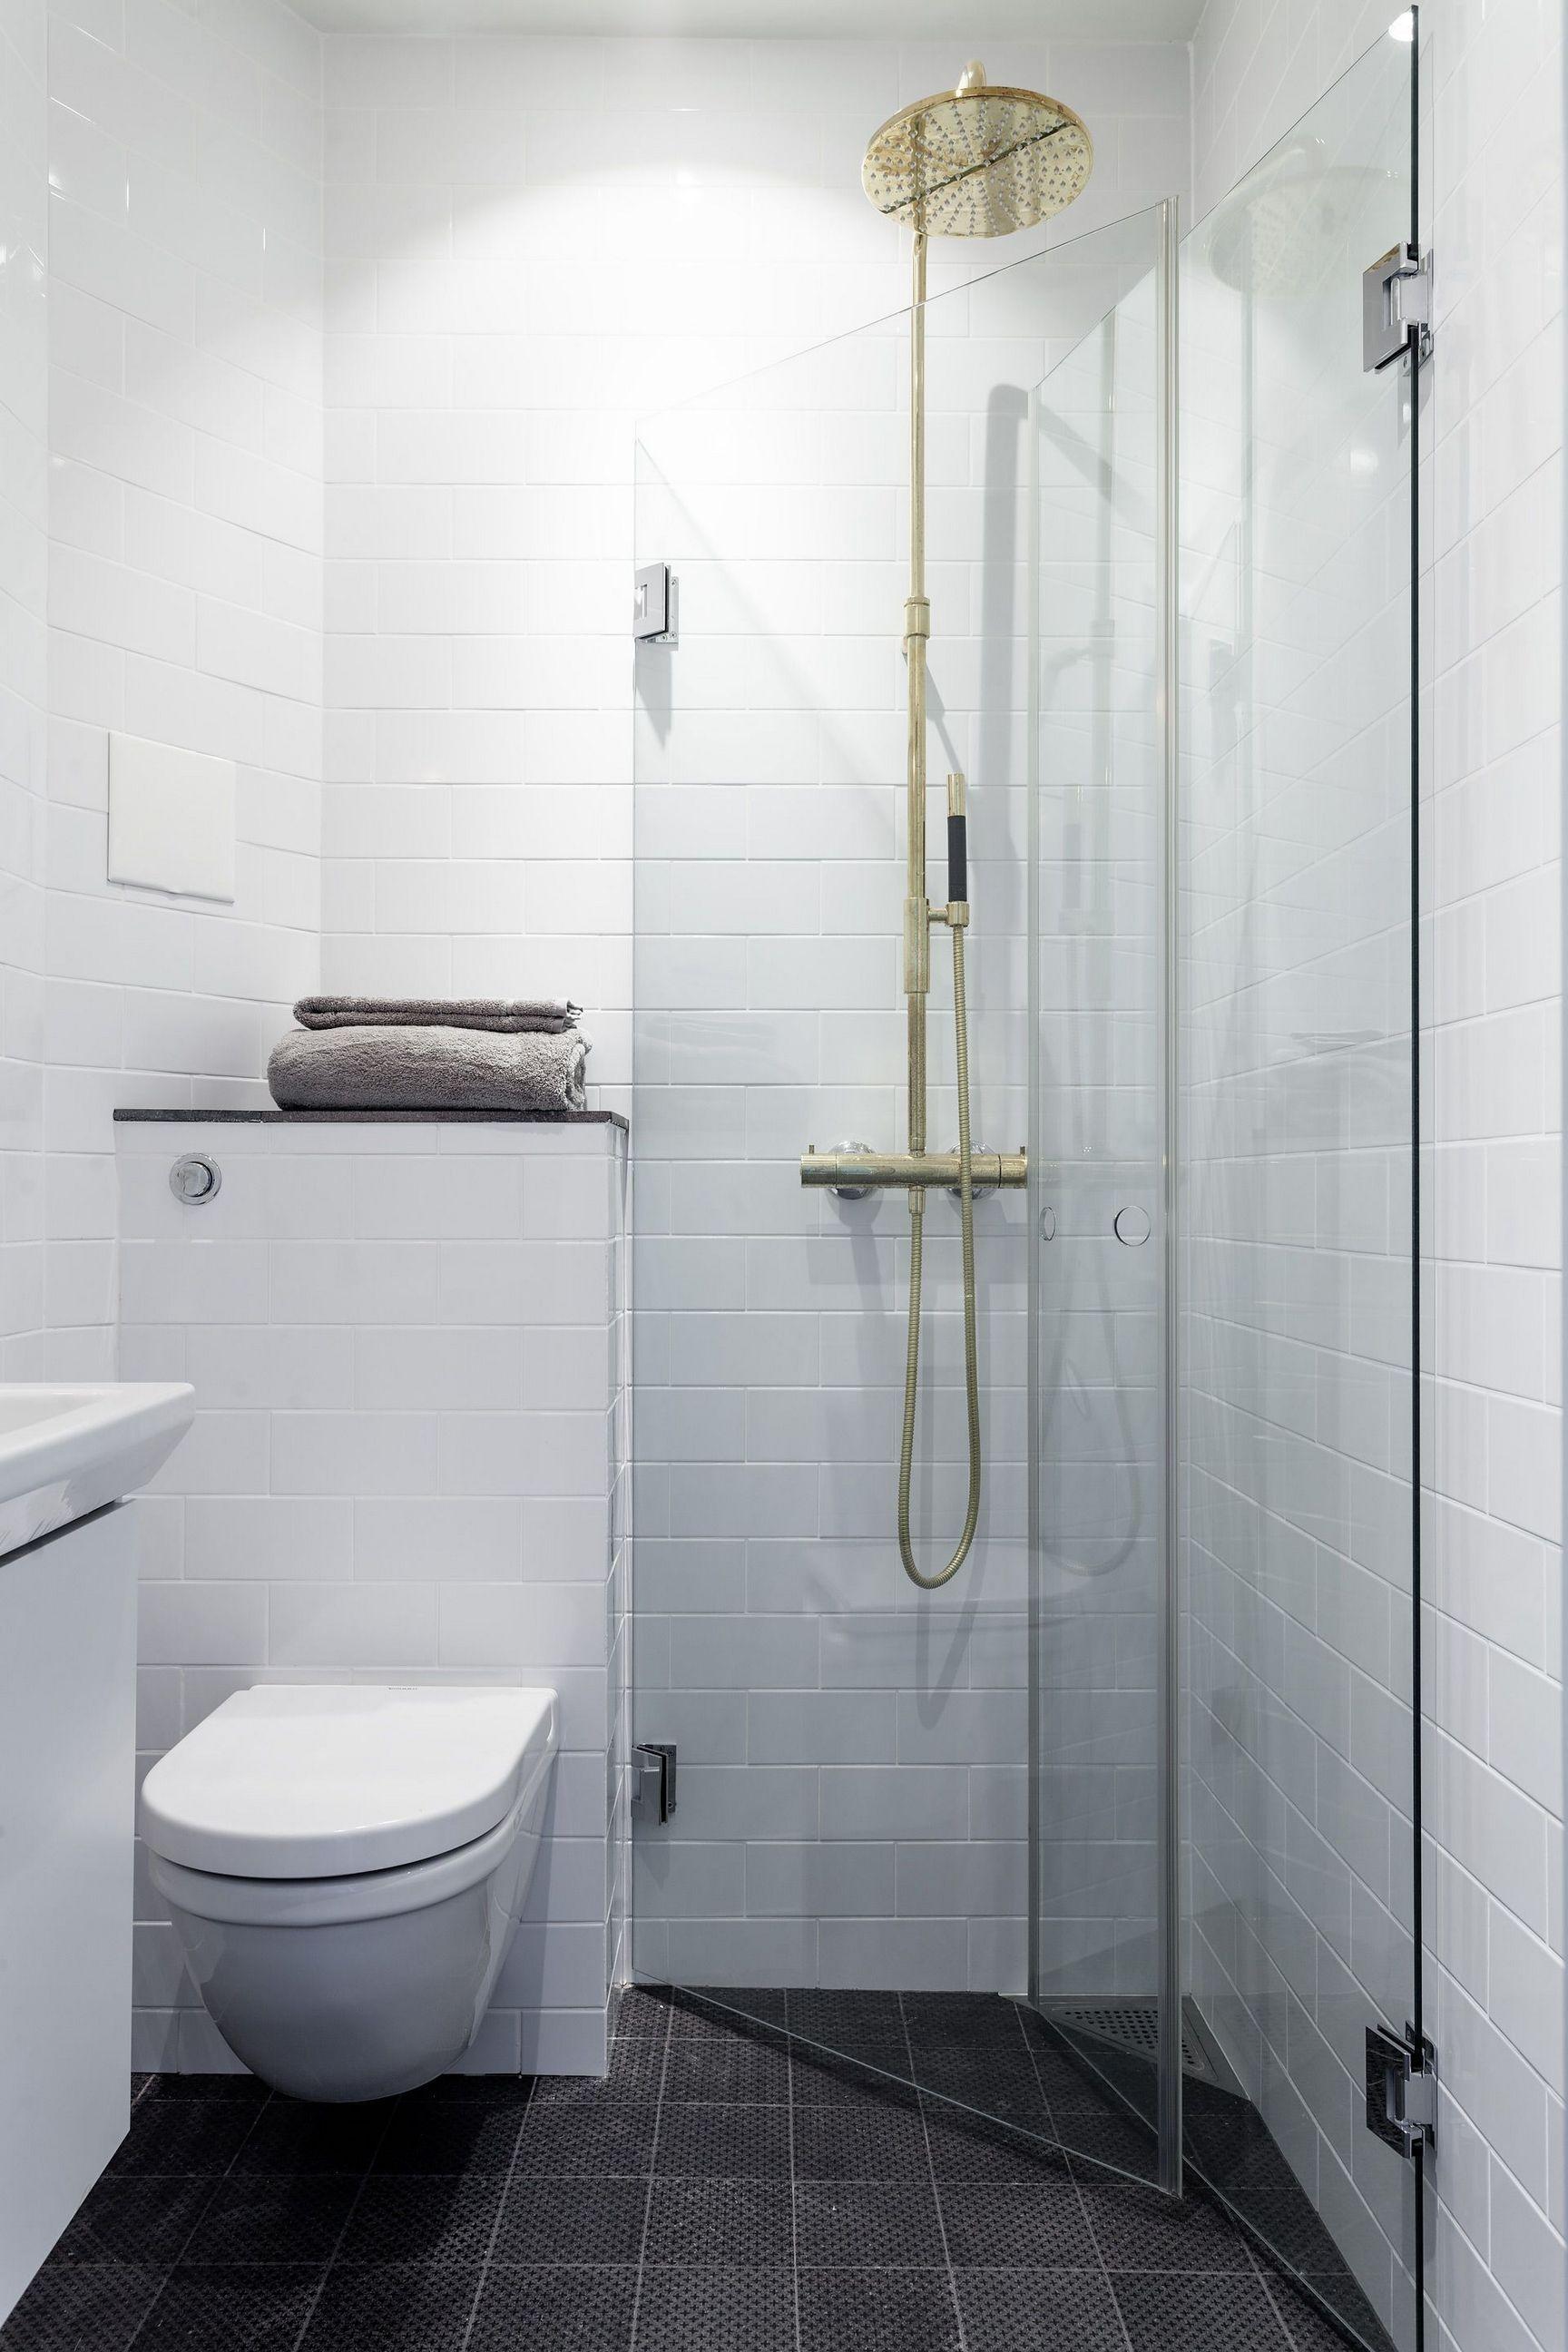 60 Brilliant Cute Small Bathroom Remodel Ideas Guest Bathroom Remodel Small Bathroom Small Bathroom Remodel